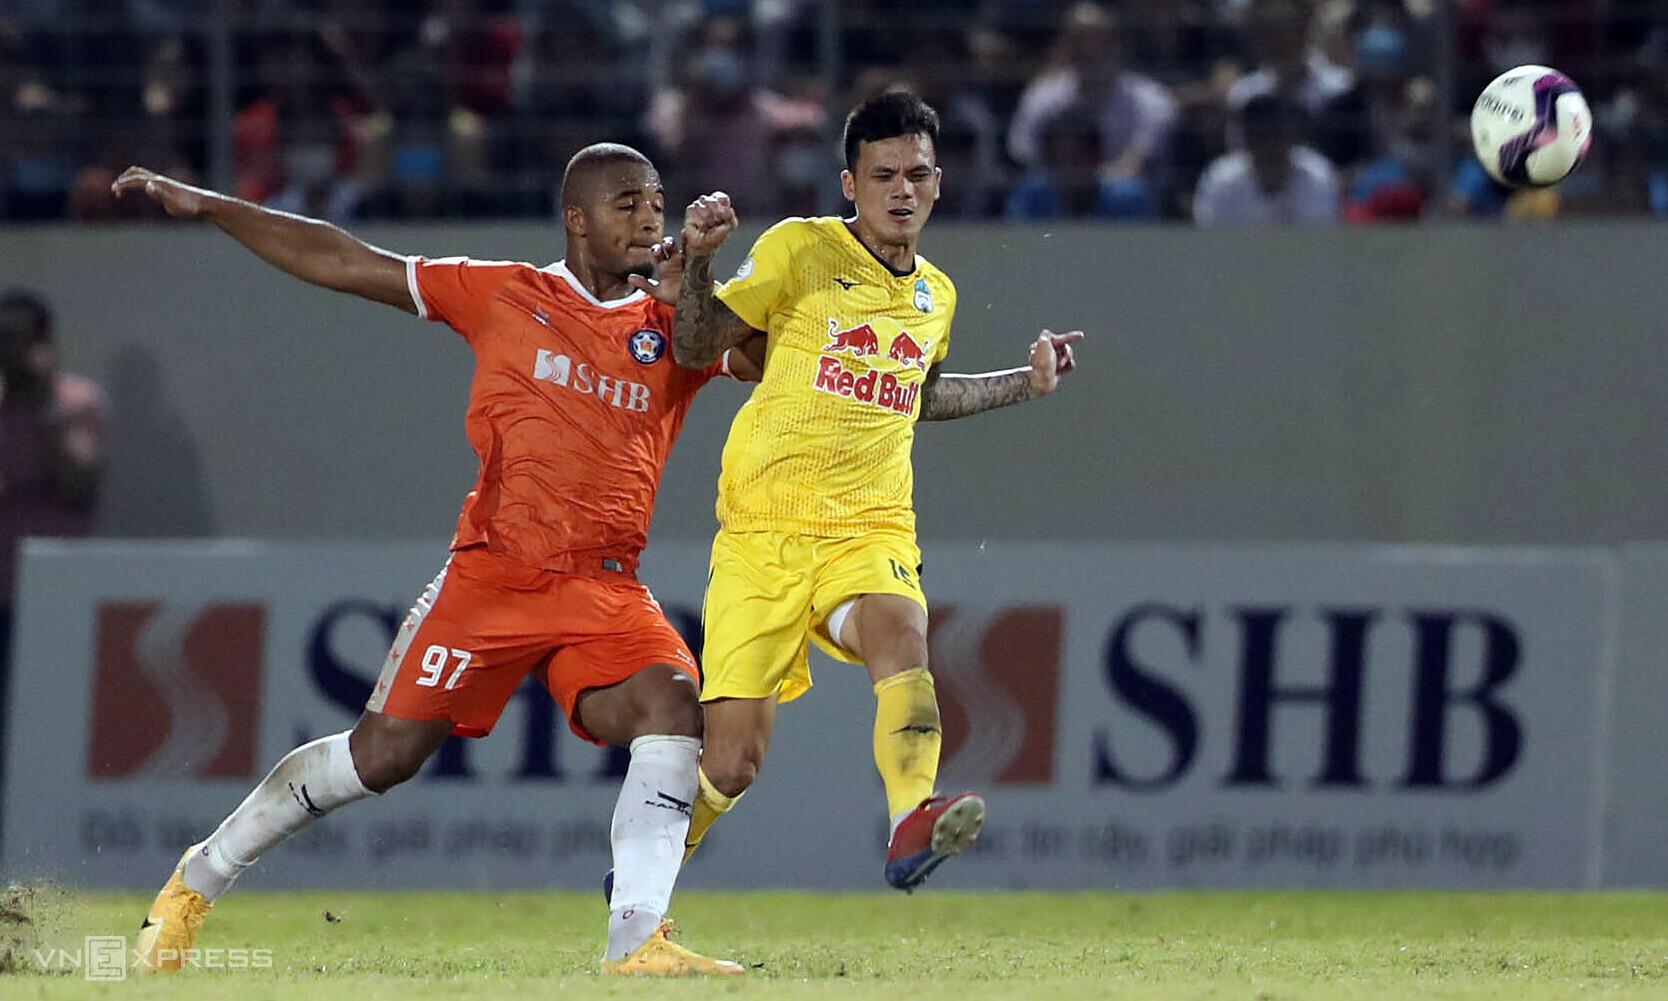 Huu Tuan (ขวา) เล่นได้ดีขึ้นหลังจากรอบแรกของ V-League ผิดพลาด  ภาพ: Duc Dong